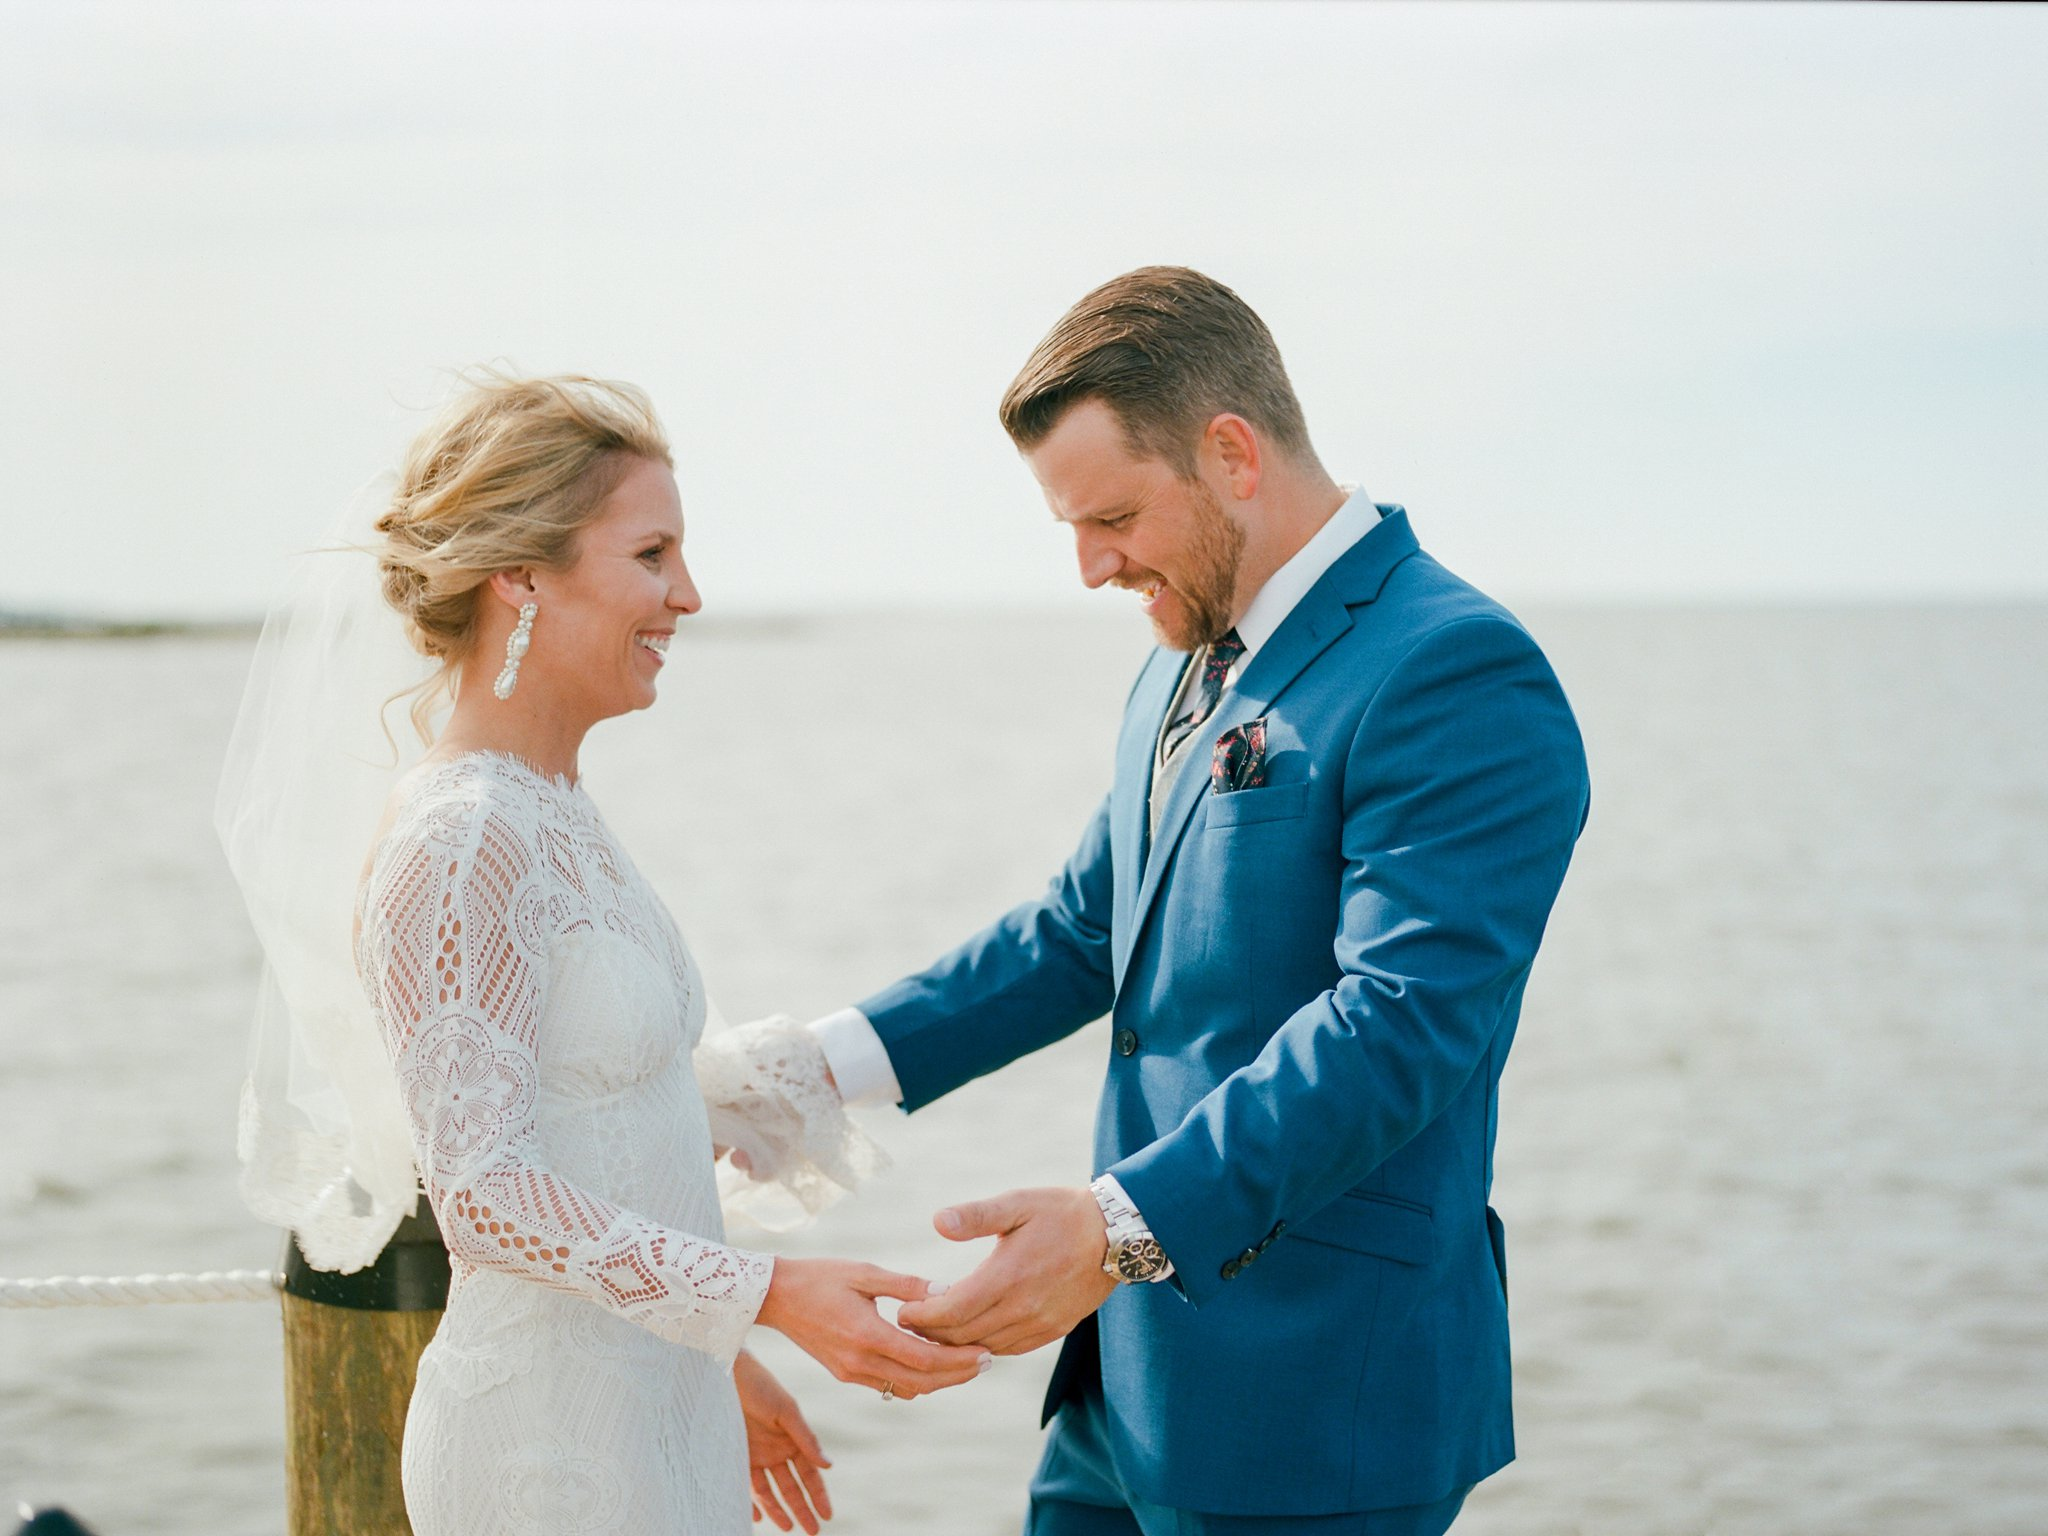 st+george+island+wedding+st+george+island+photographer+shannon+griffin+photography_0001.jpg